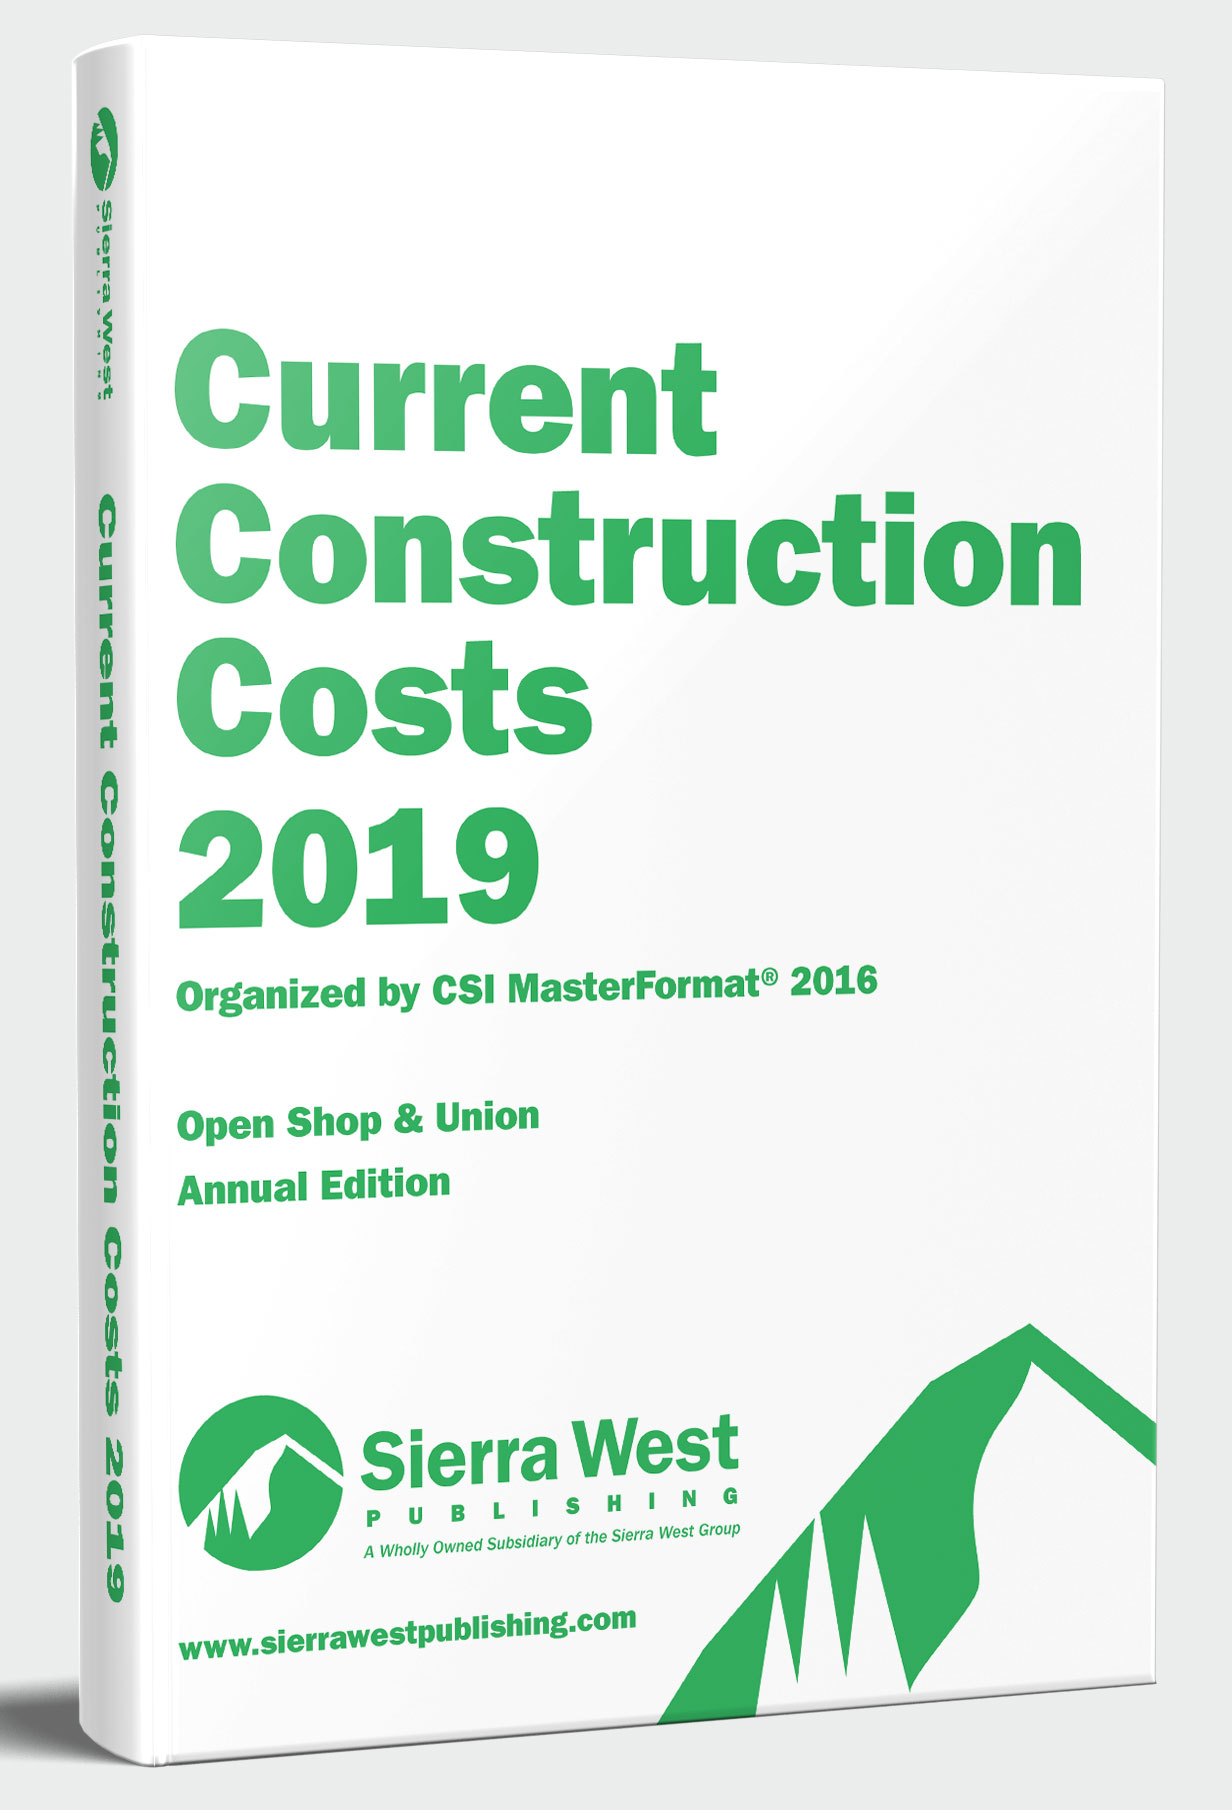 Home - Sierra West Publishing